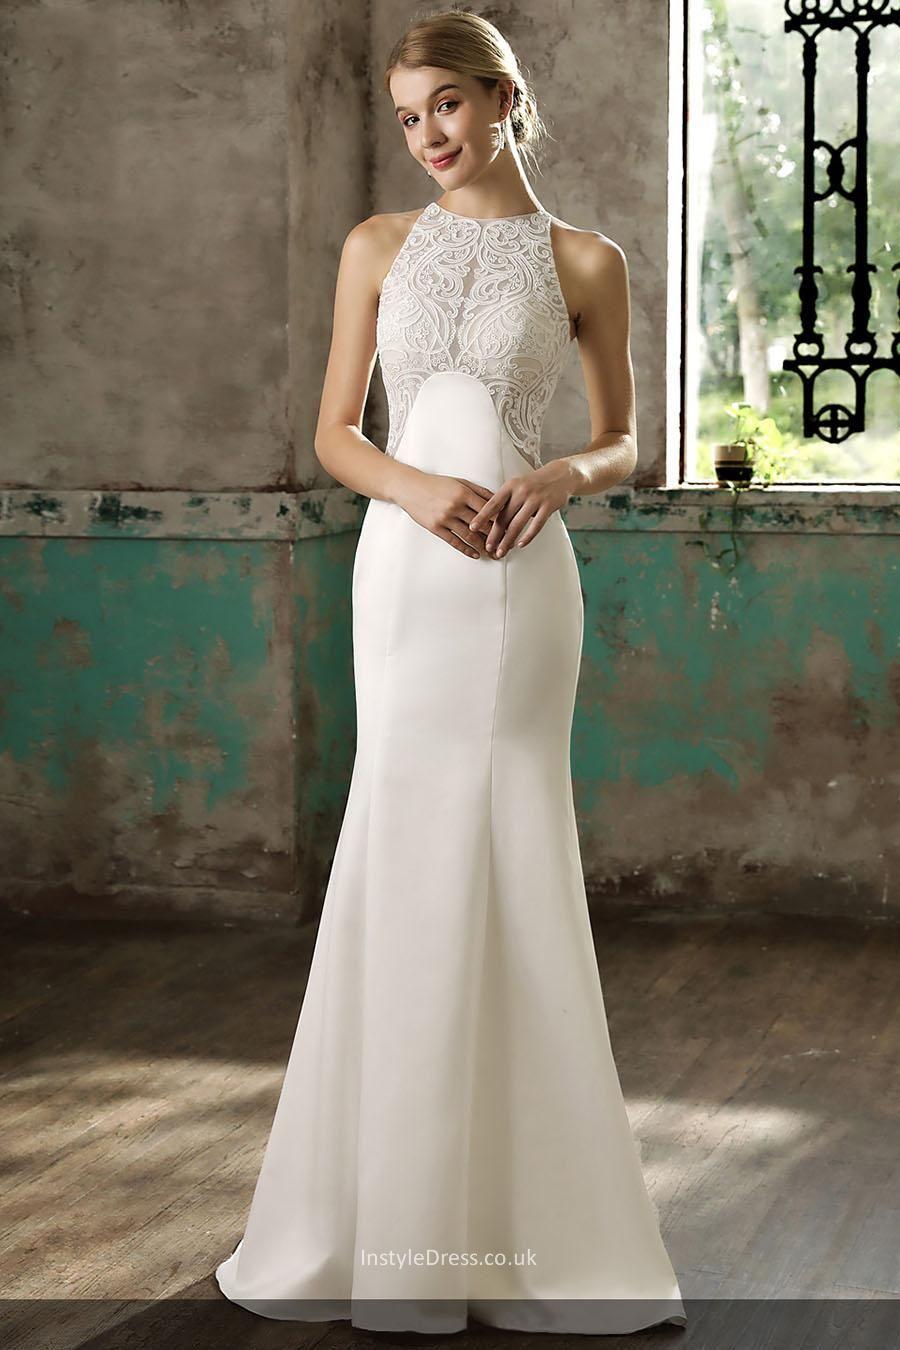 Slim fit wedding dresses  Sleeveless Lace Bodice Satin Slim Fit Floor Length Bridal Gown